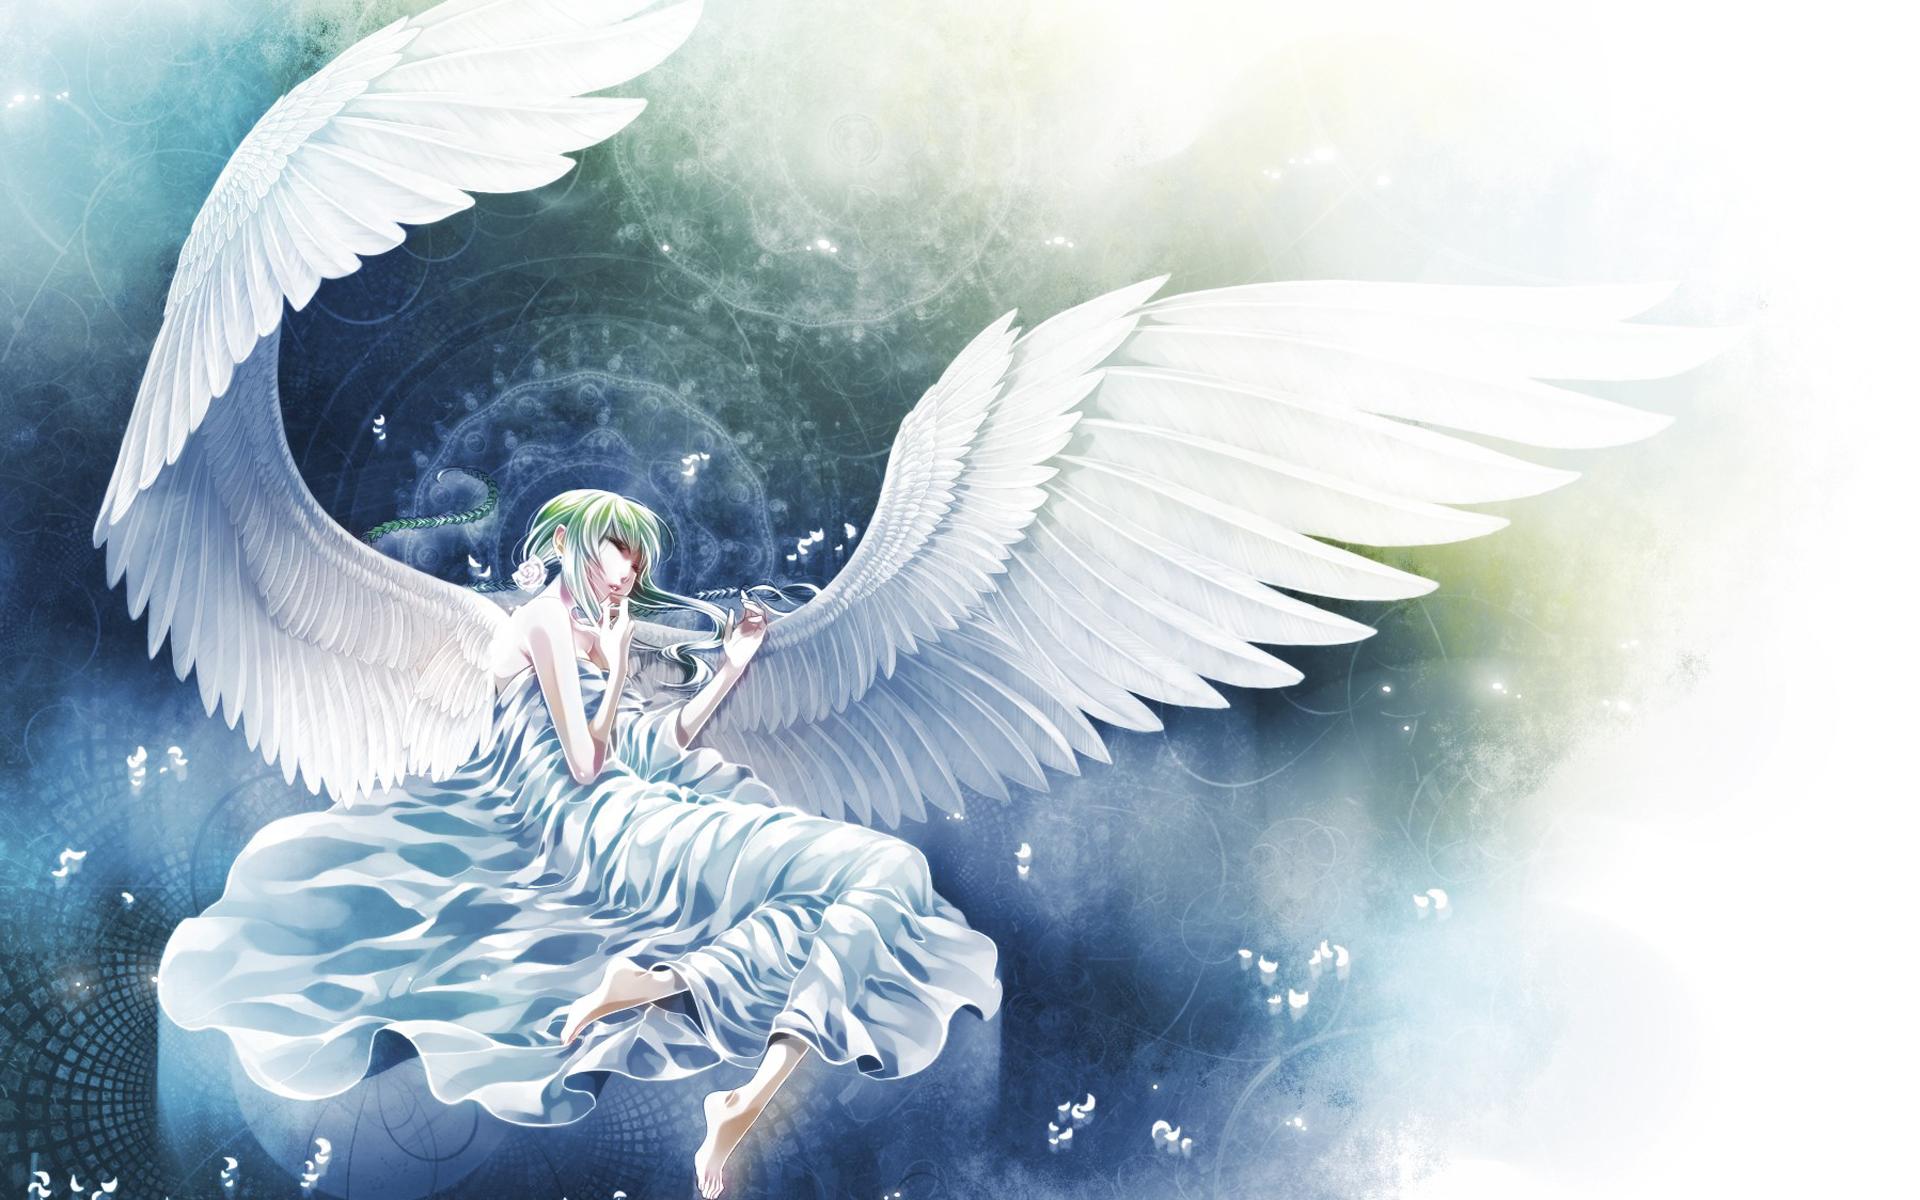 anime girl wings - photo #24